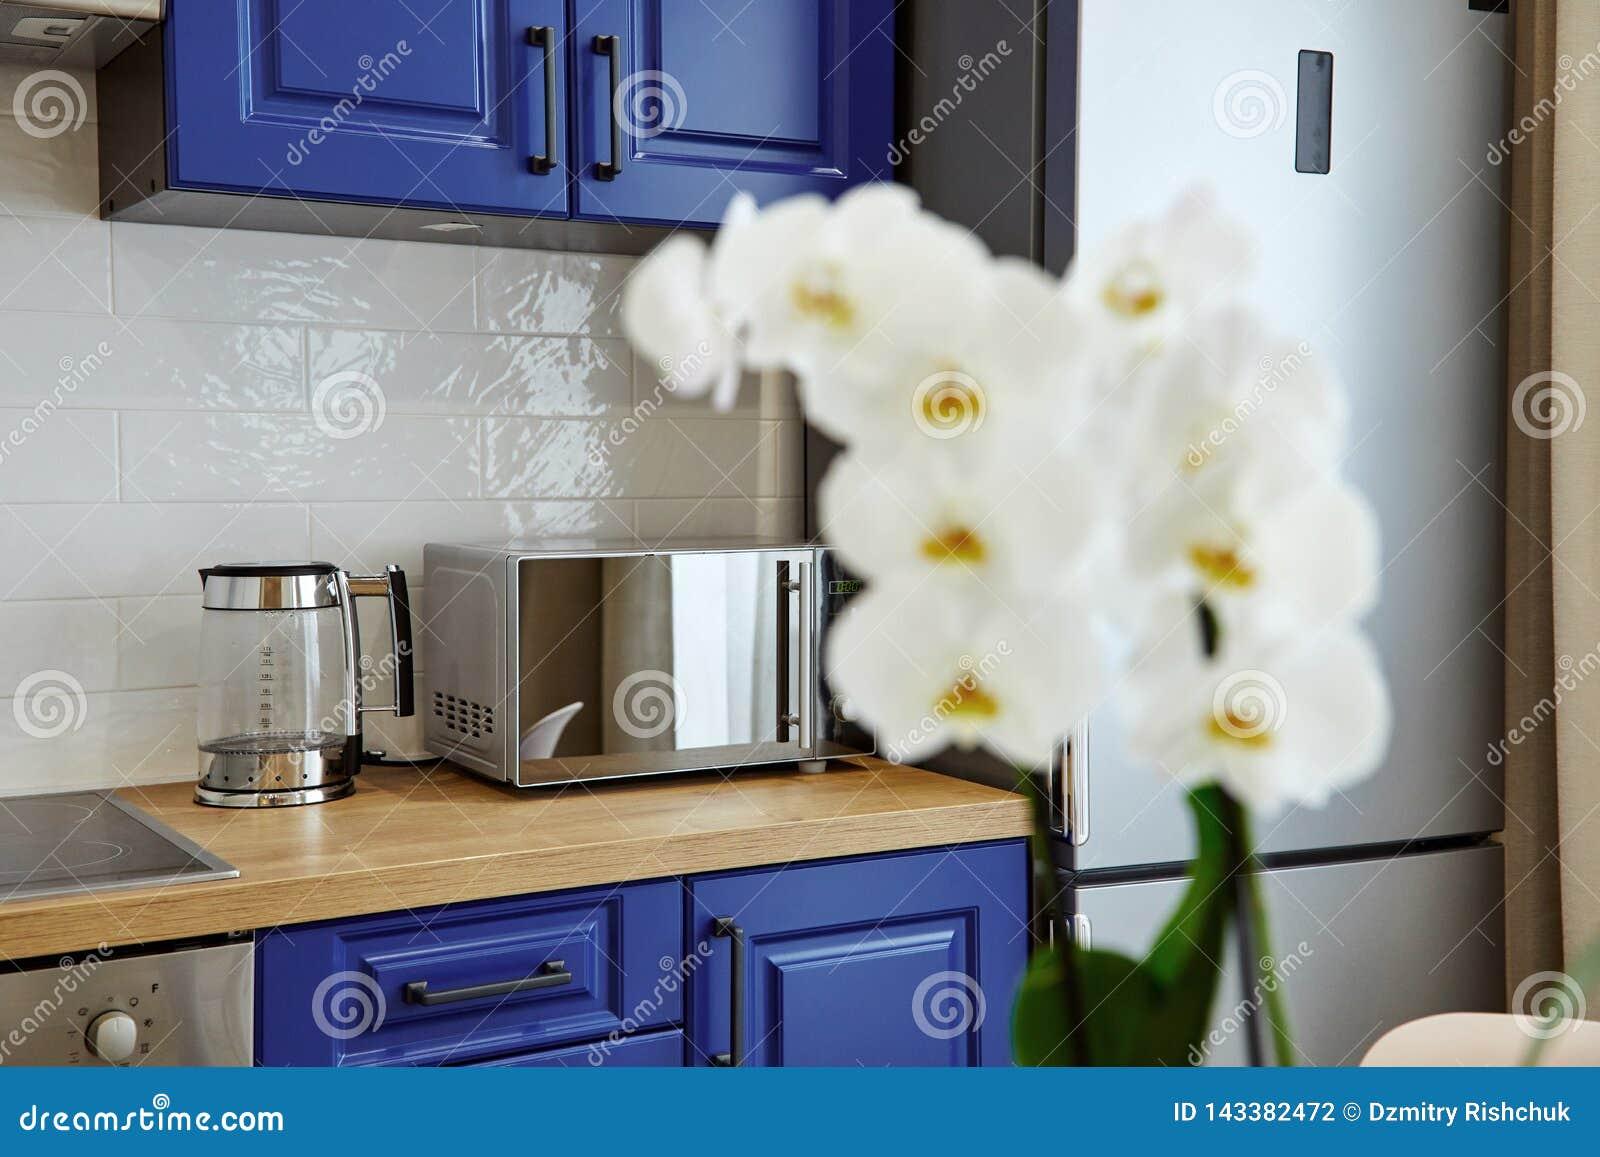 Modern kitchen with flowers. Home interior decor.